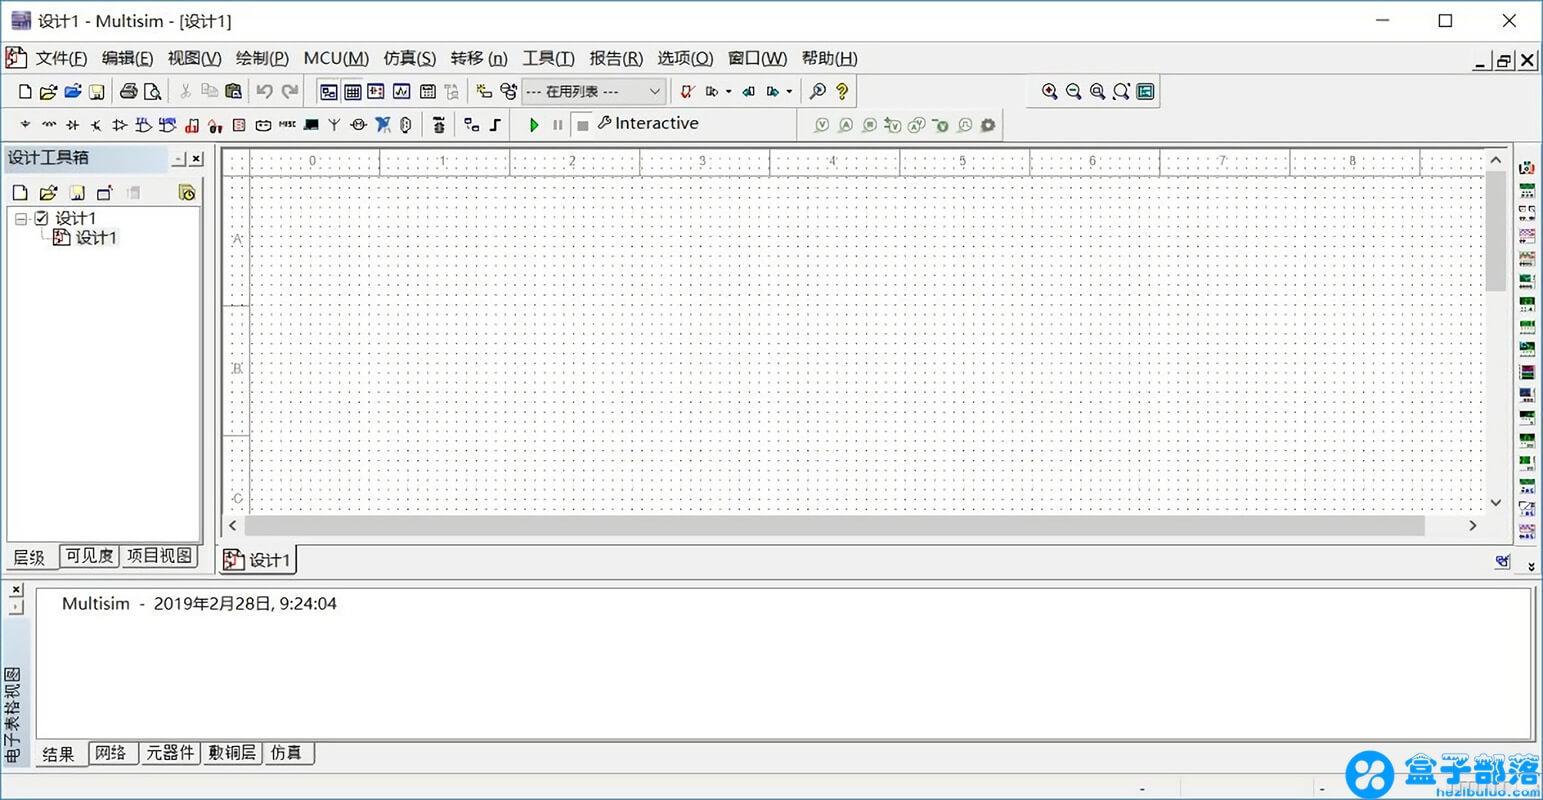 Multisim 13.0 电路功能测试虚拟仿真软件